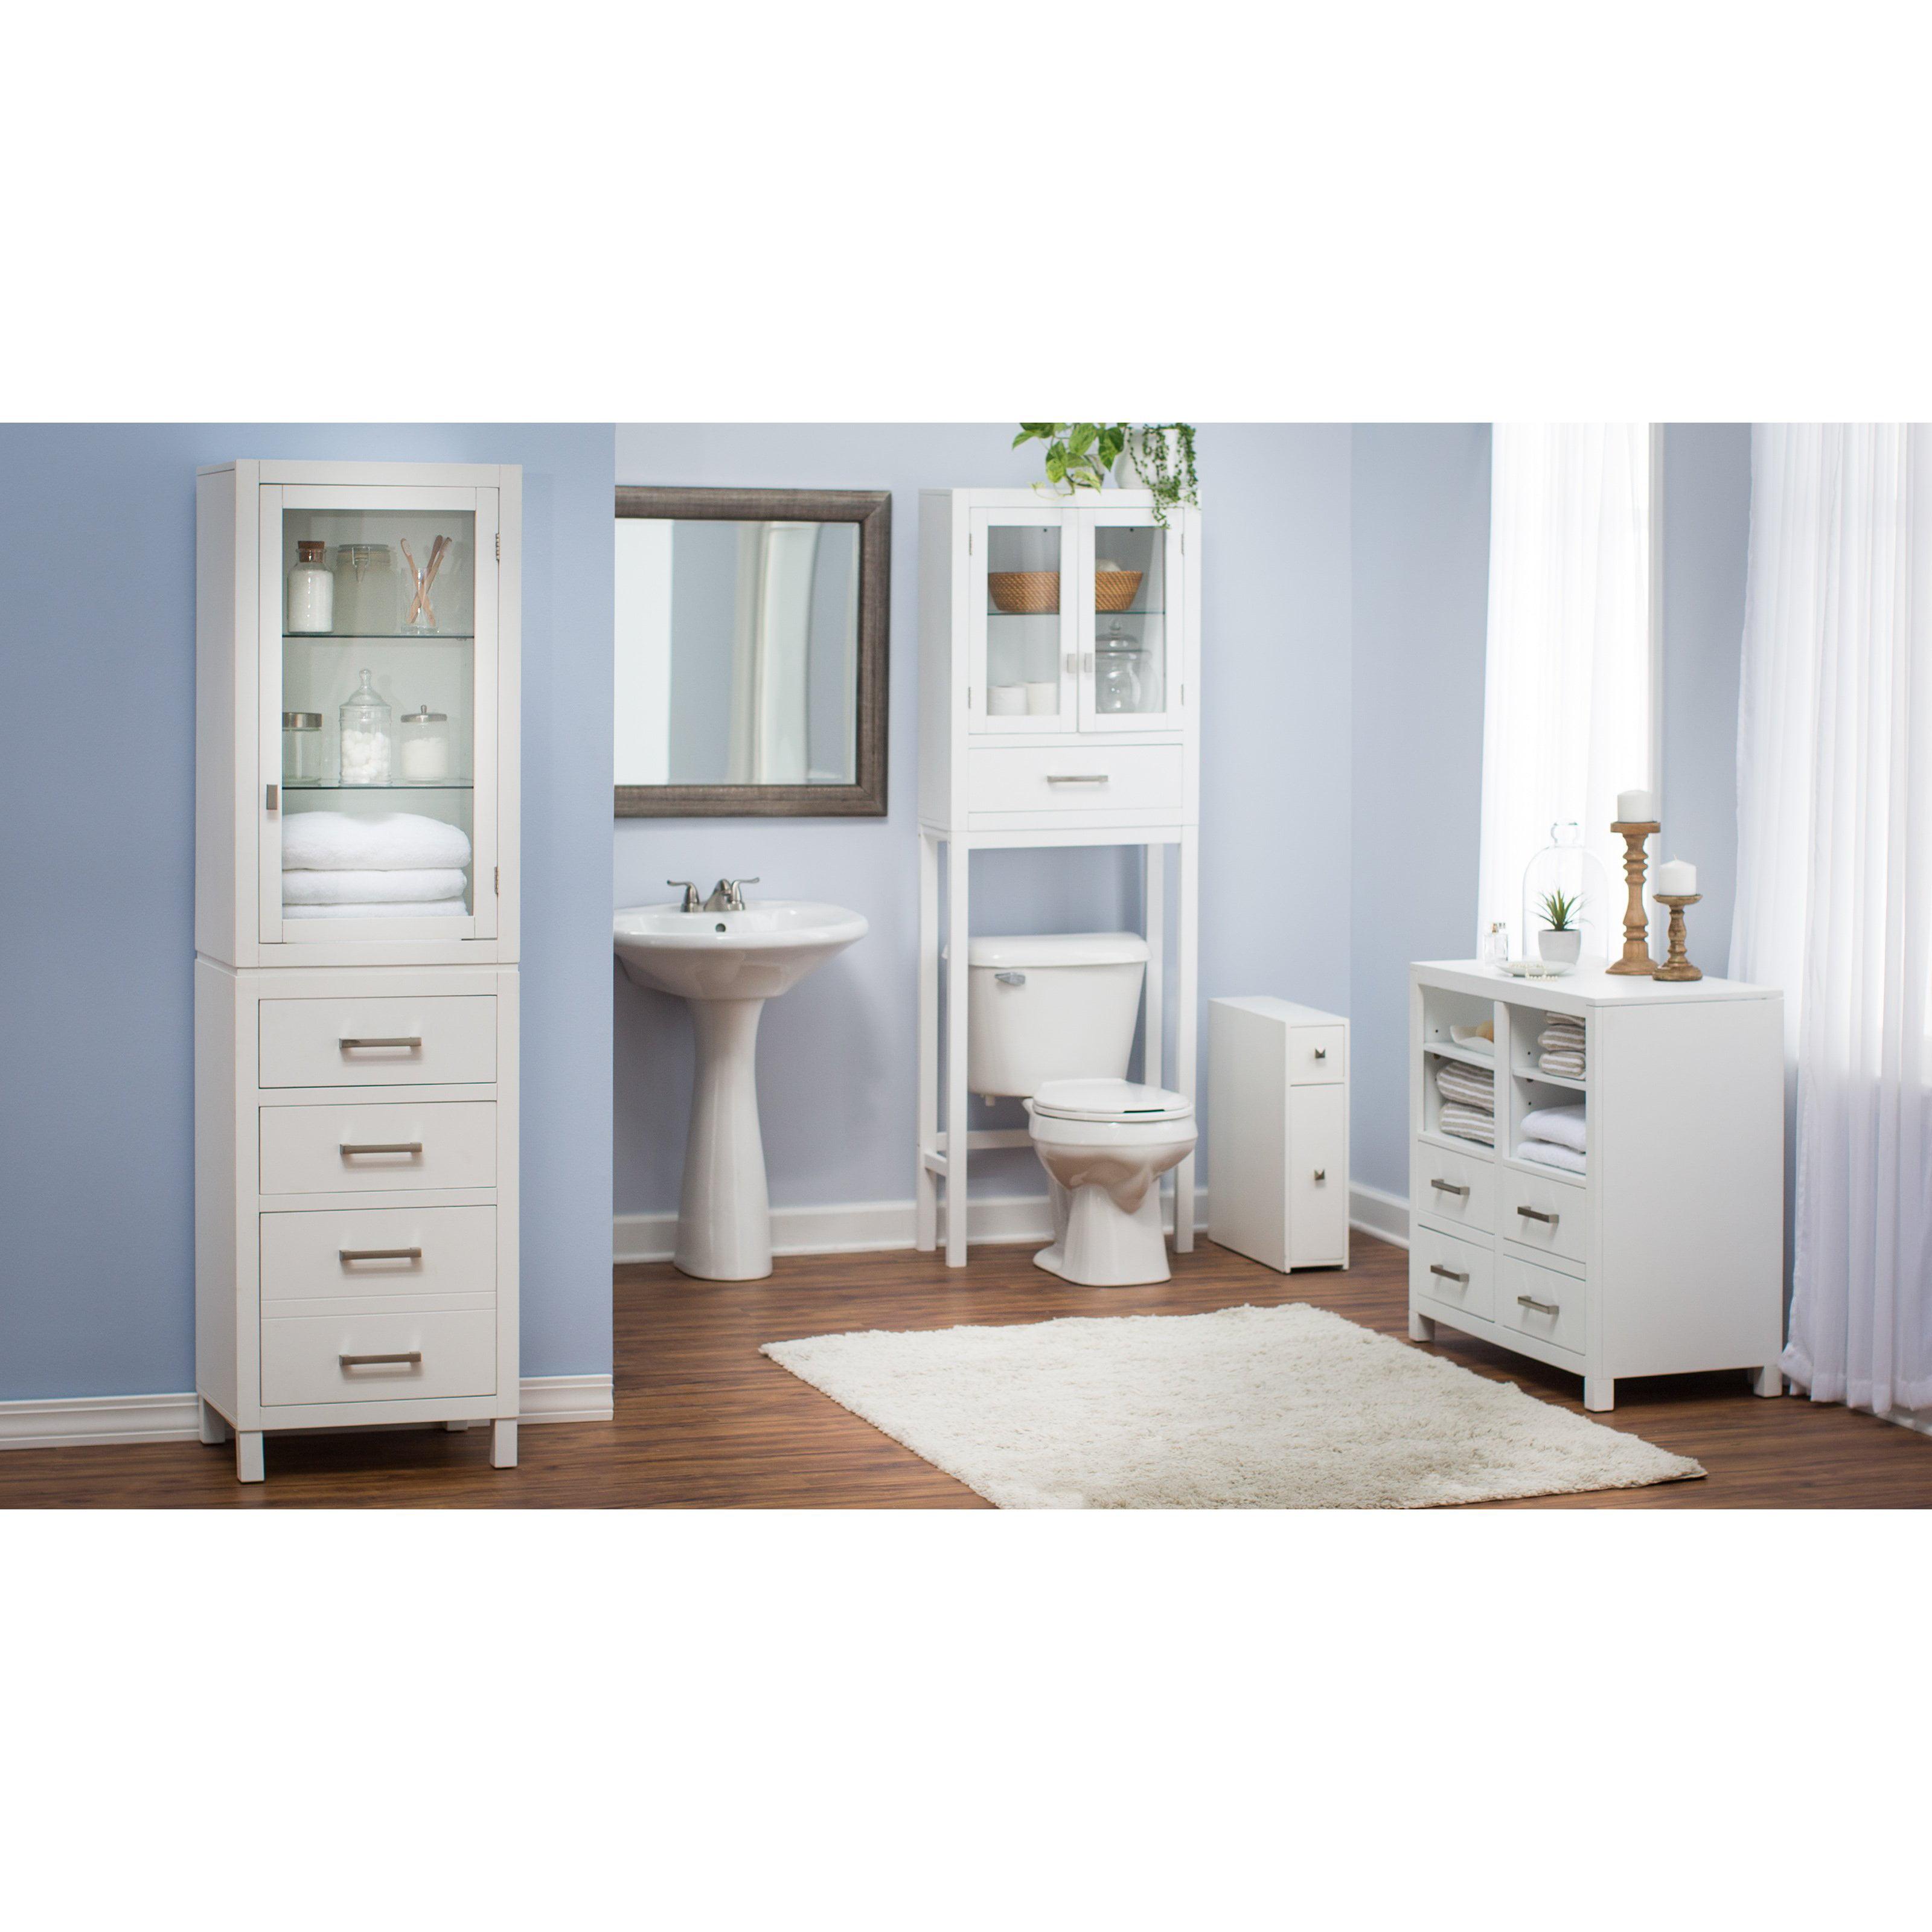 Belham Living Longbourn Narrow Bath Cabinet - Walmart.com